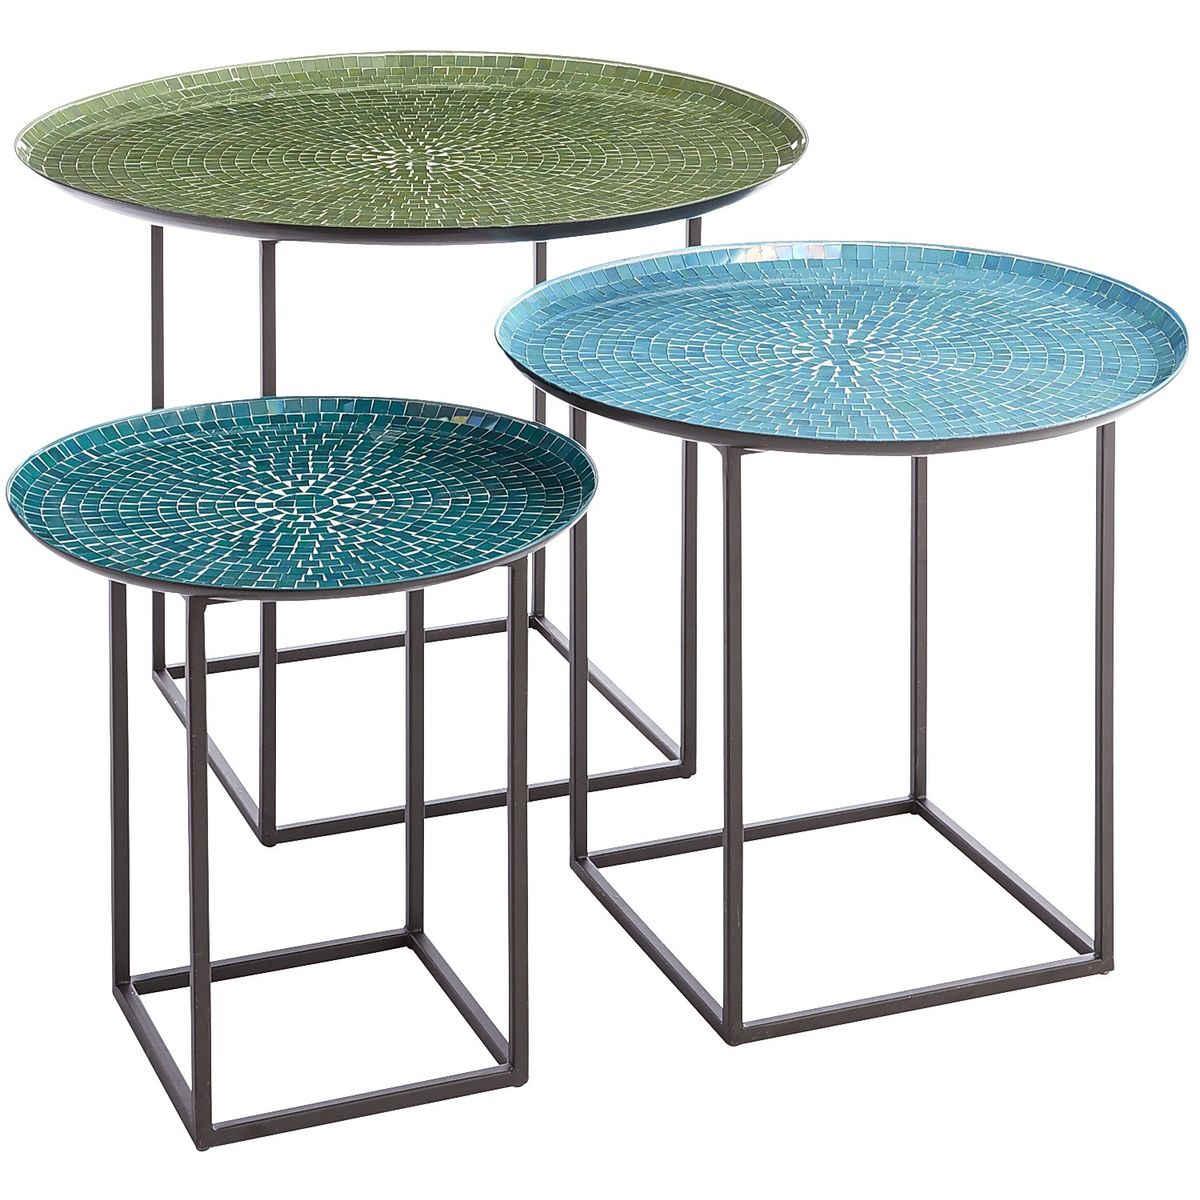 Coffee Table Set - $399.95